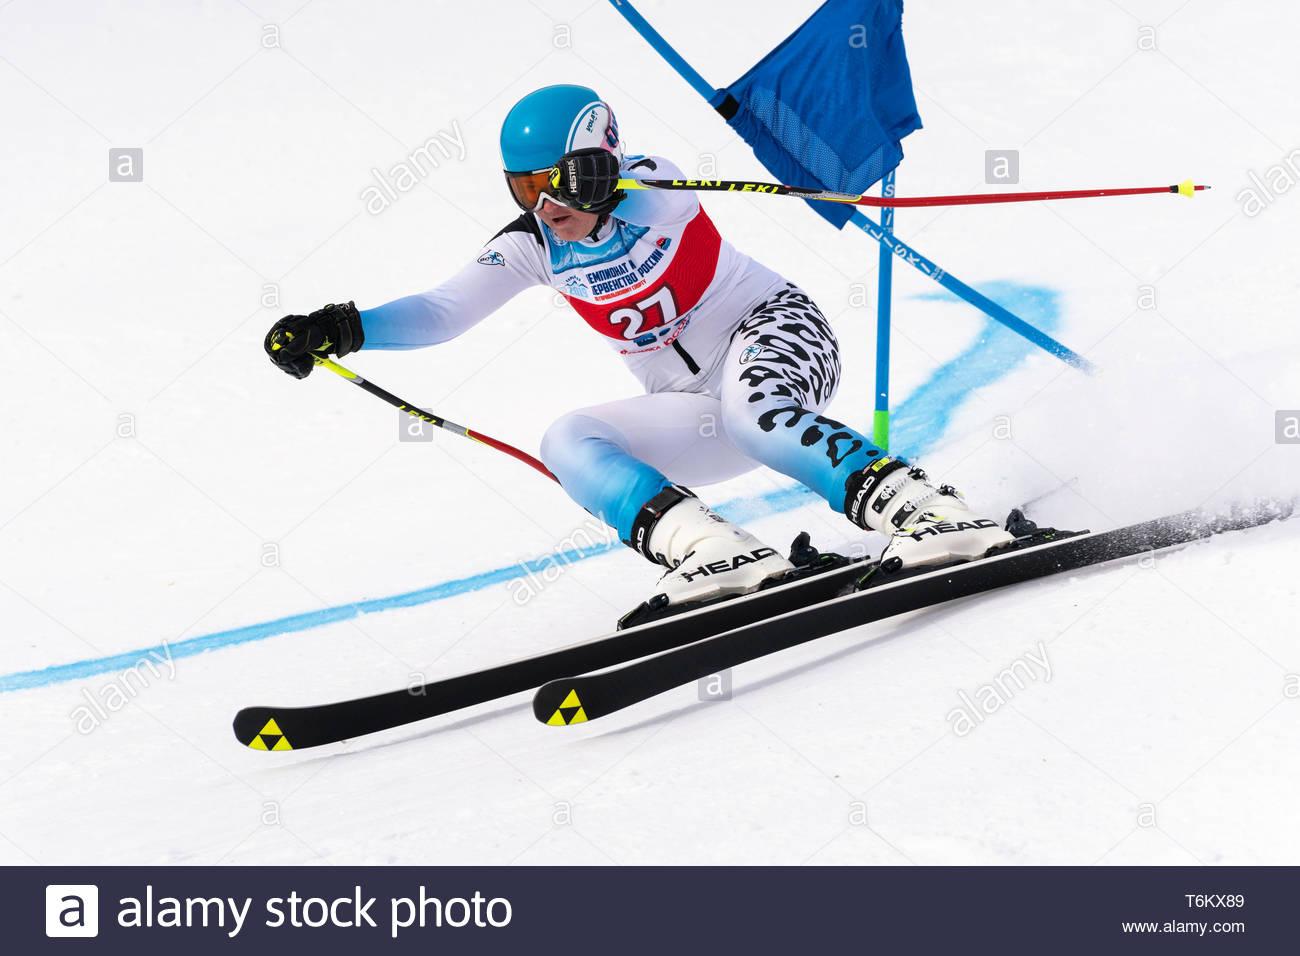 KAMCHATKA PENINSULA, RUSSIA - APR 2, 2019: Mountain skier Veronika Gavrish (Murmansk) skiing down mount slope. Russian Women's Alpine Skiing Cup, Inte - Stock Image